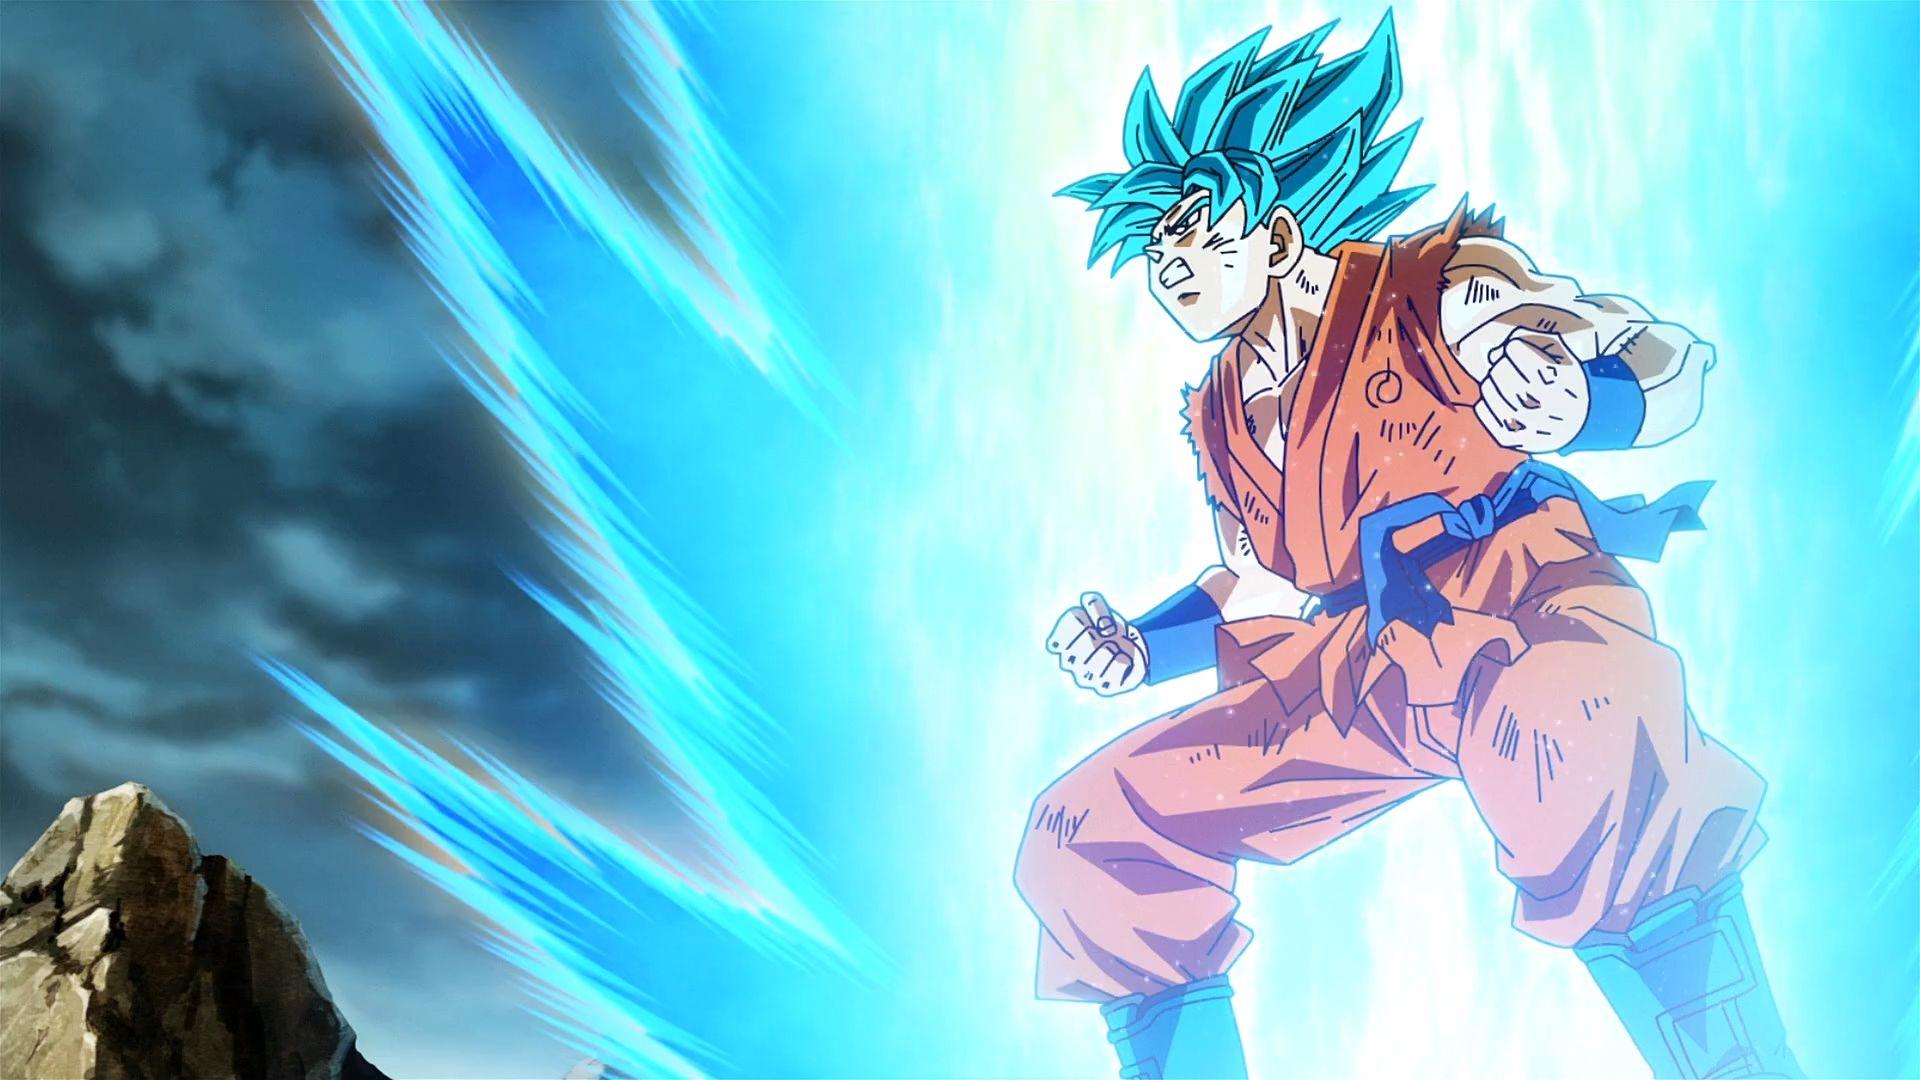 Goku Wallpaper Goku Super Saiyan Wallpapers Goku Super Saiyan Blue Dragon ball z goku blue moon